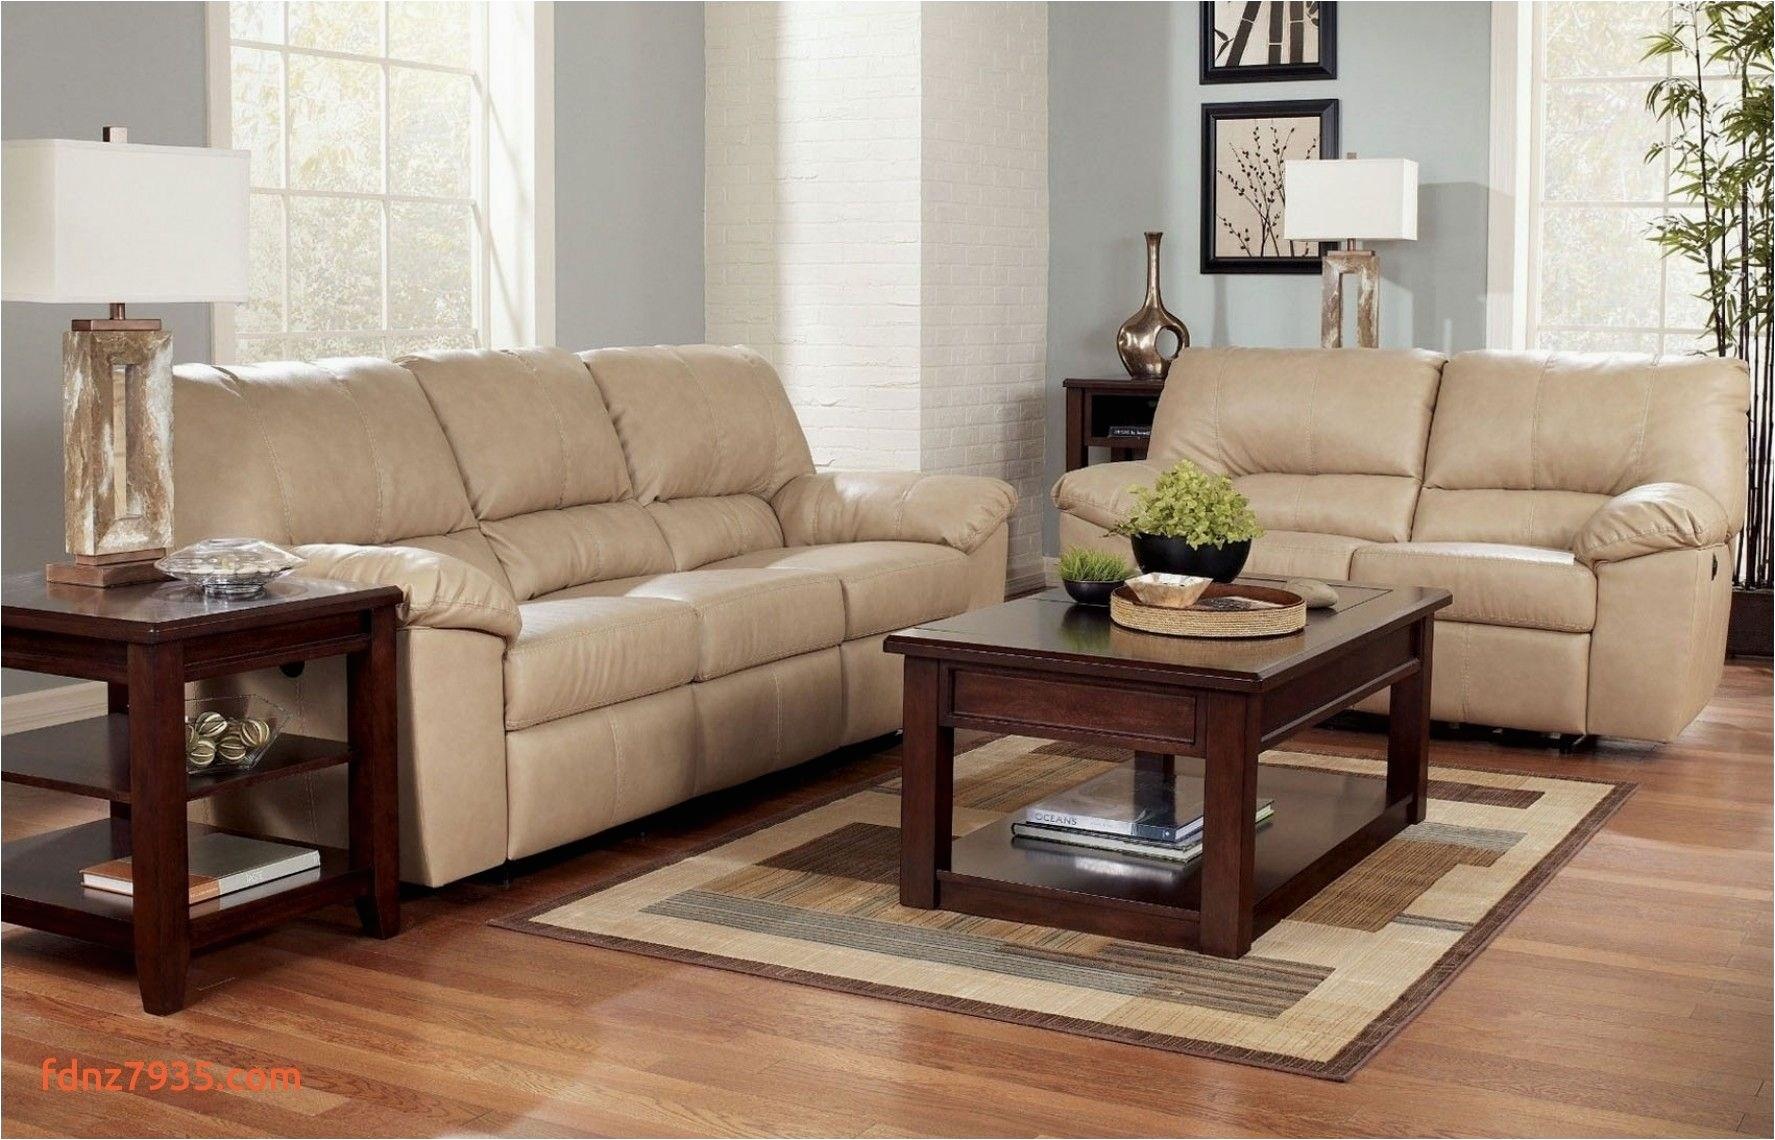 ashley furniture brown couch new ashley furniture swivel chair fresh sofa design photograph of ashley